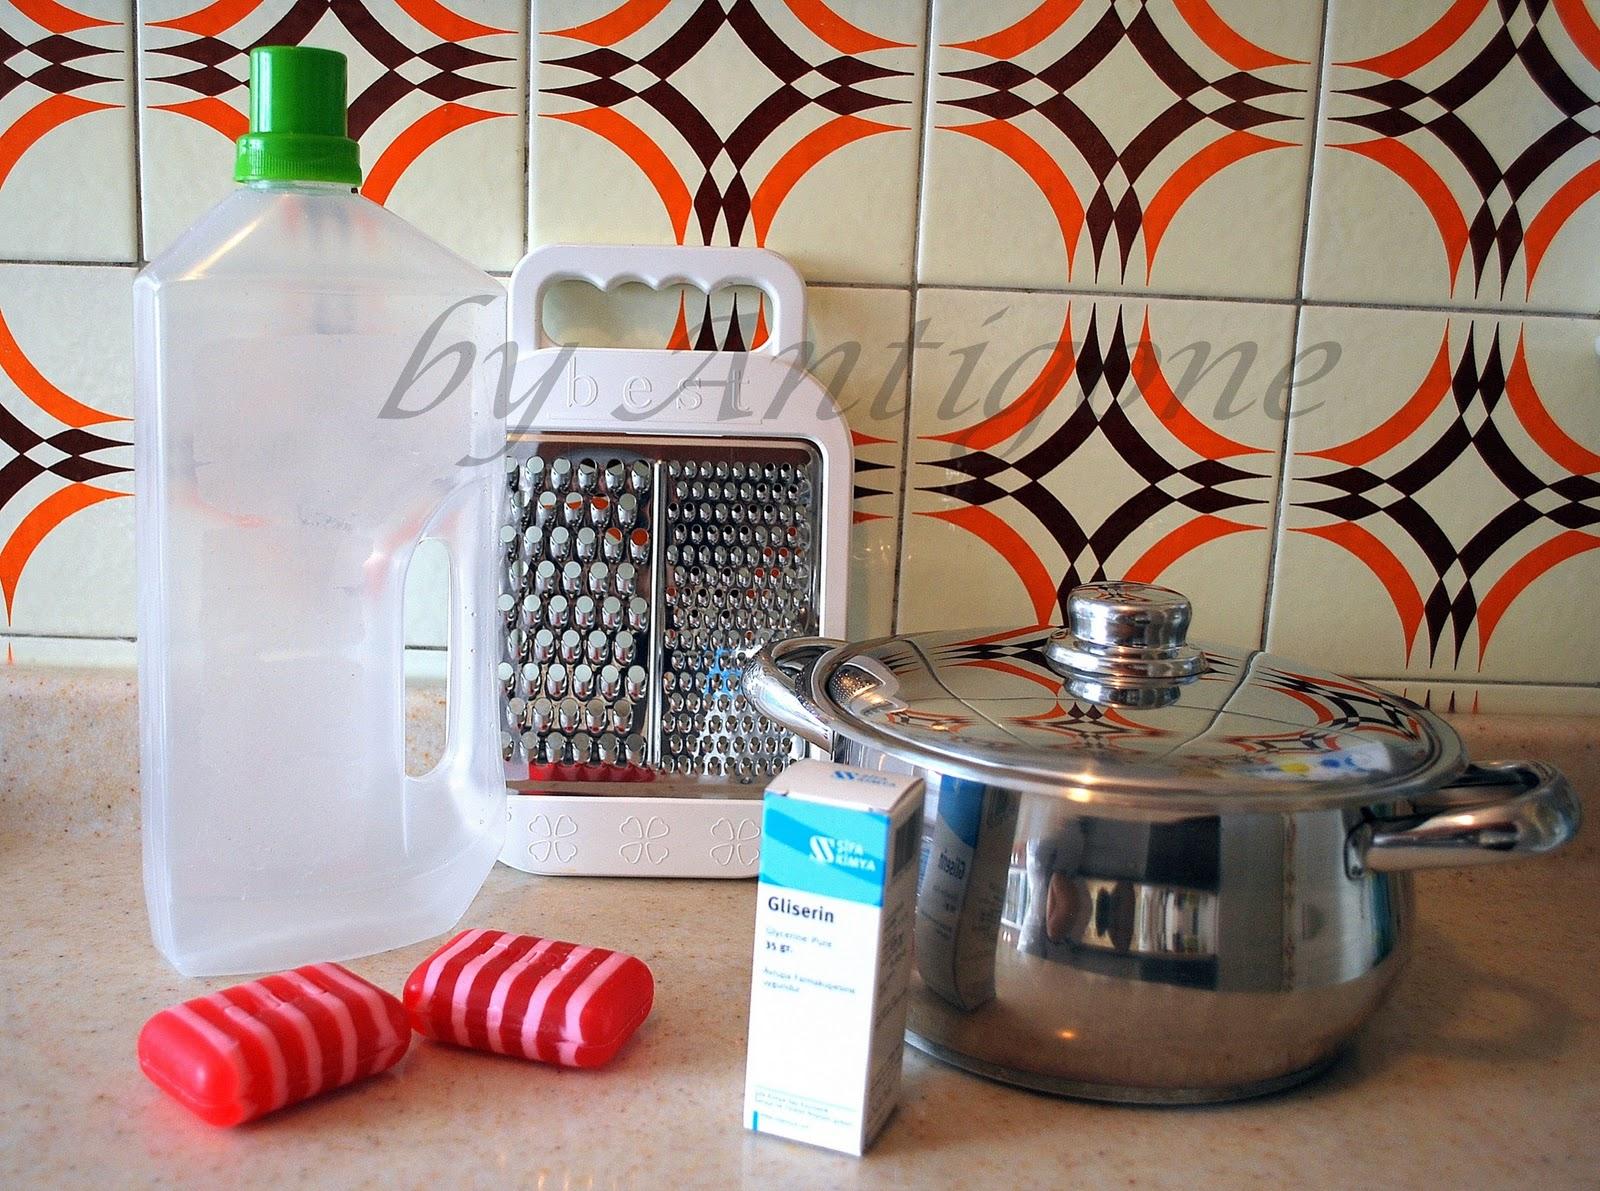 Ev Yapımı Doğal Sıvı Sabun